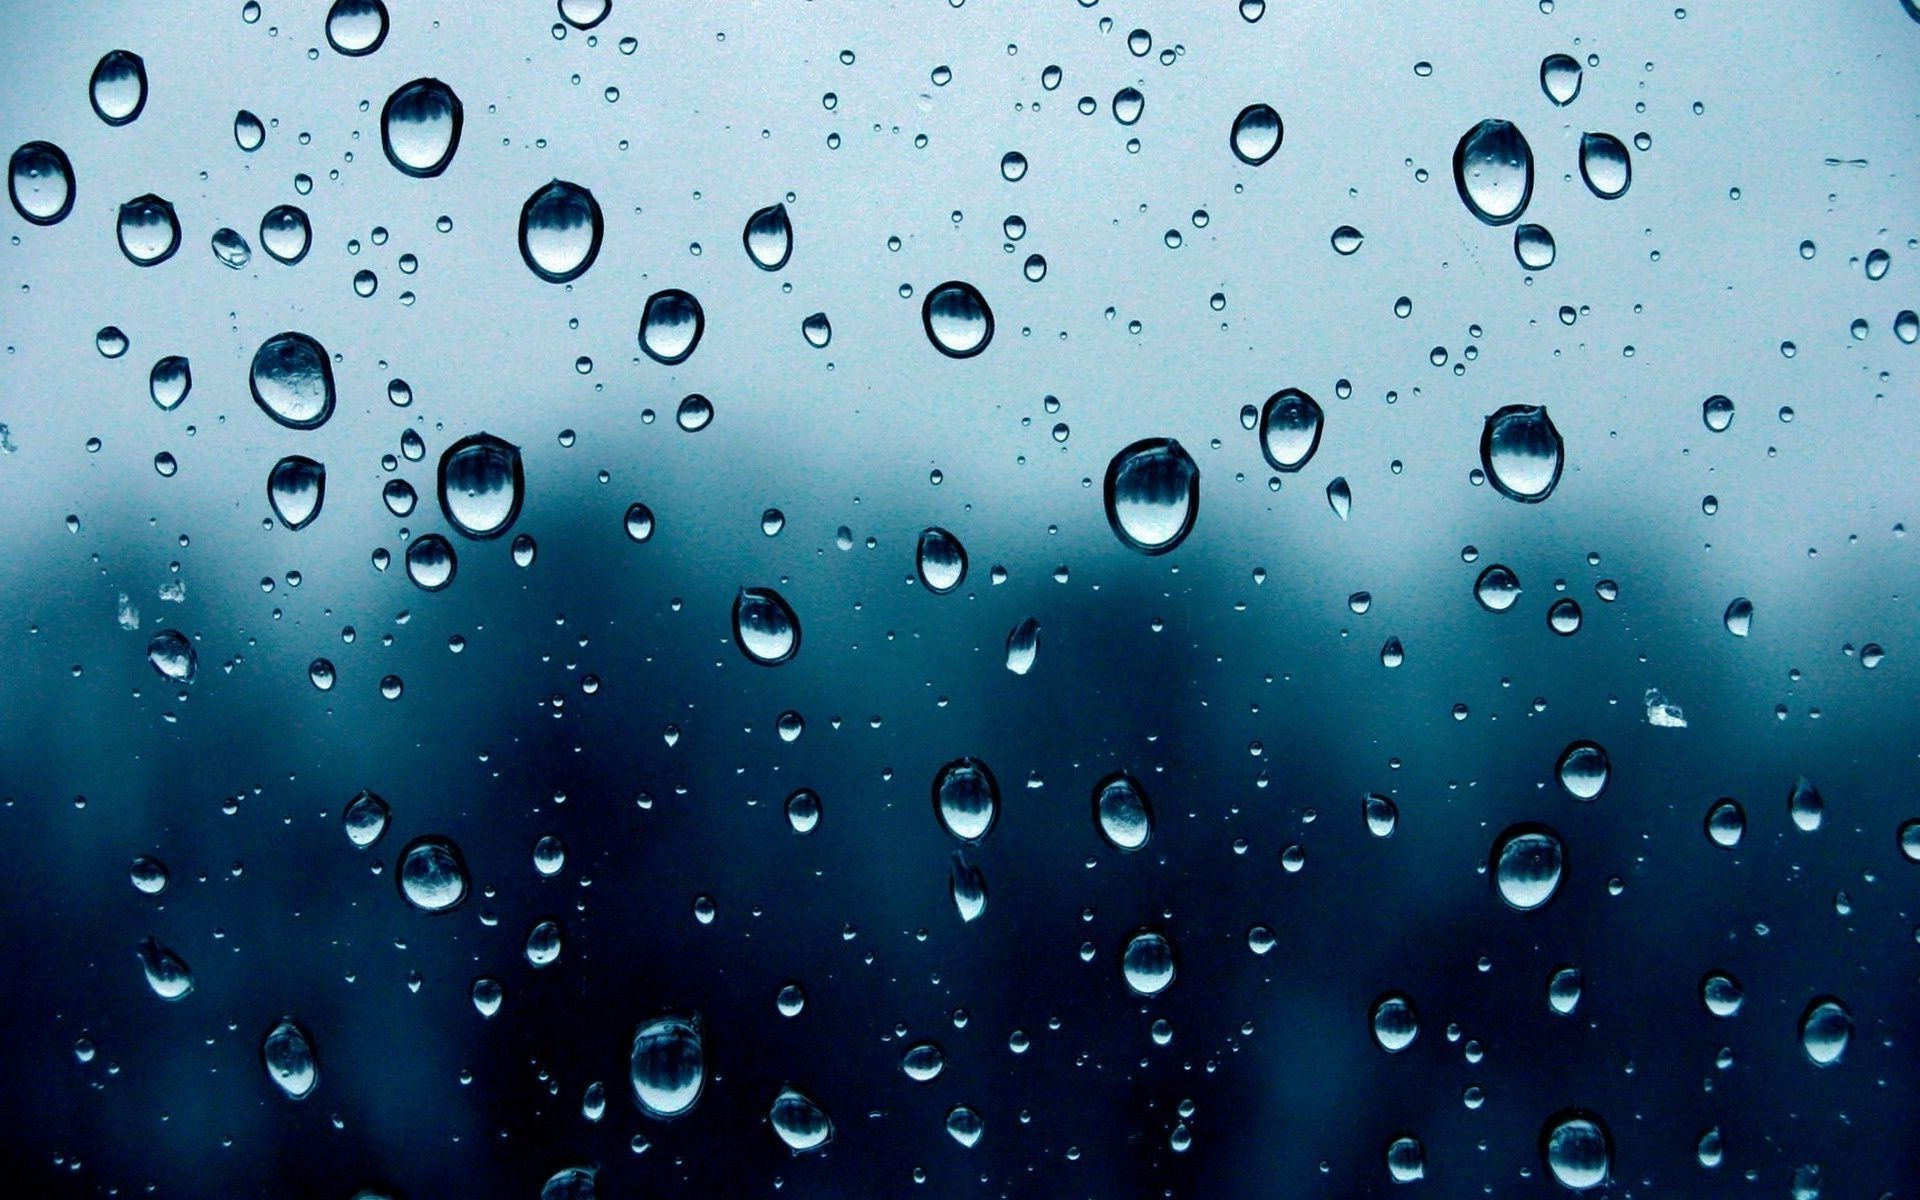 картинки для телефона дождя фреймут, едва